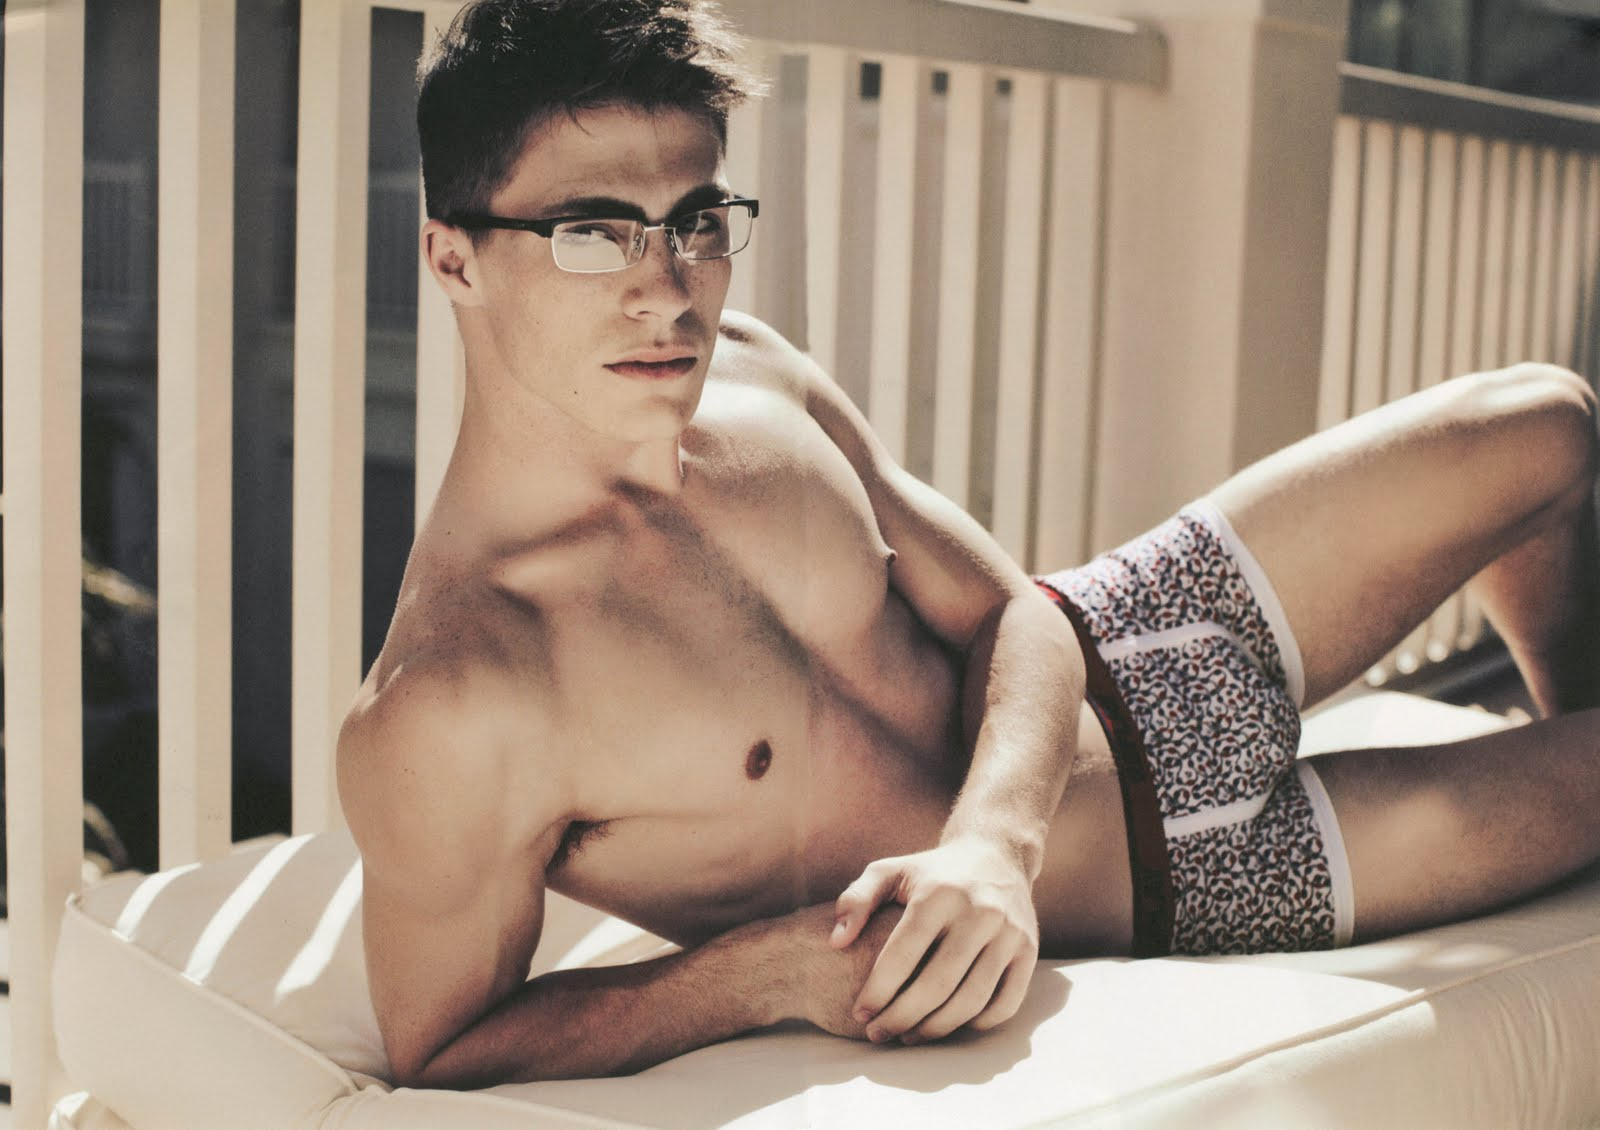 Teen Wolf Stud Colton Haynes In His Underwear